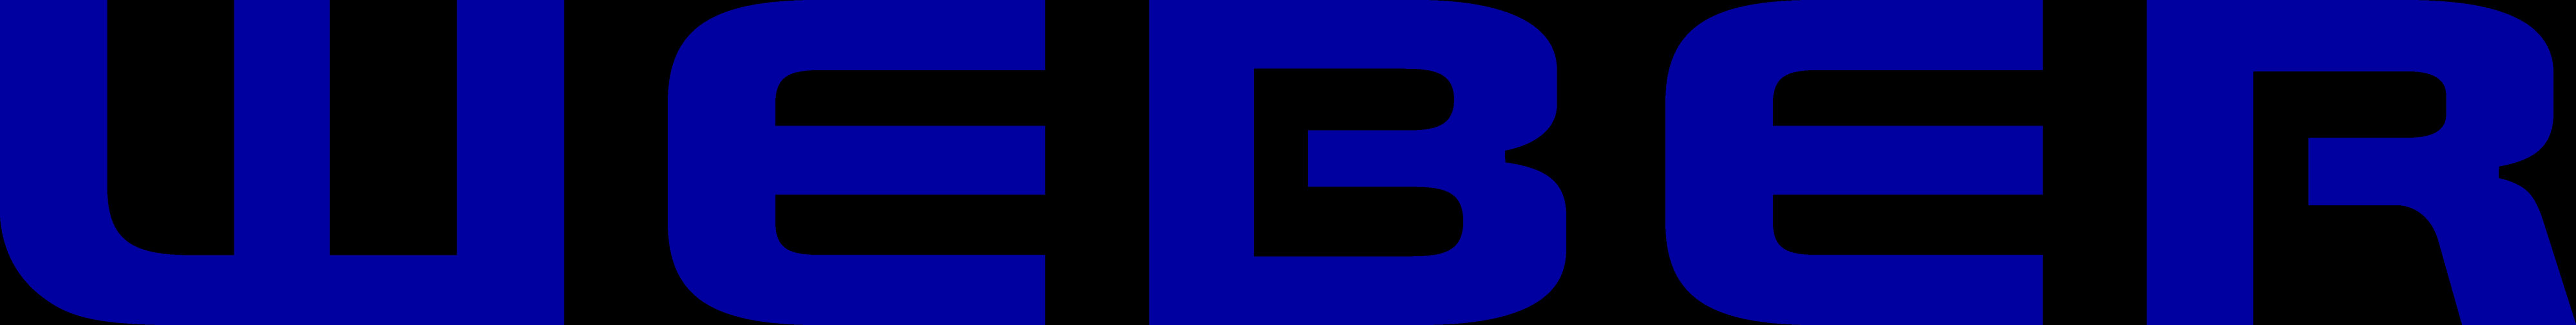 weber.digital GmbH